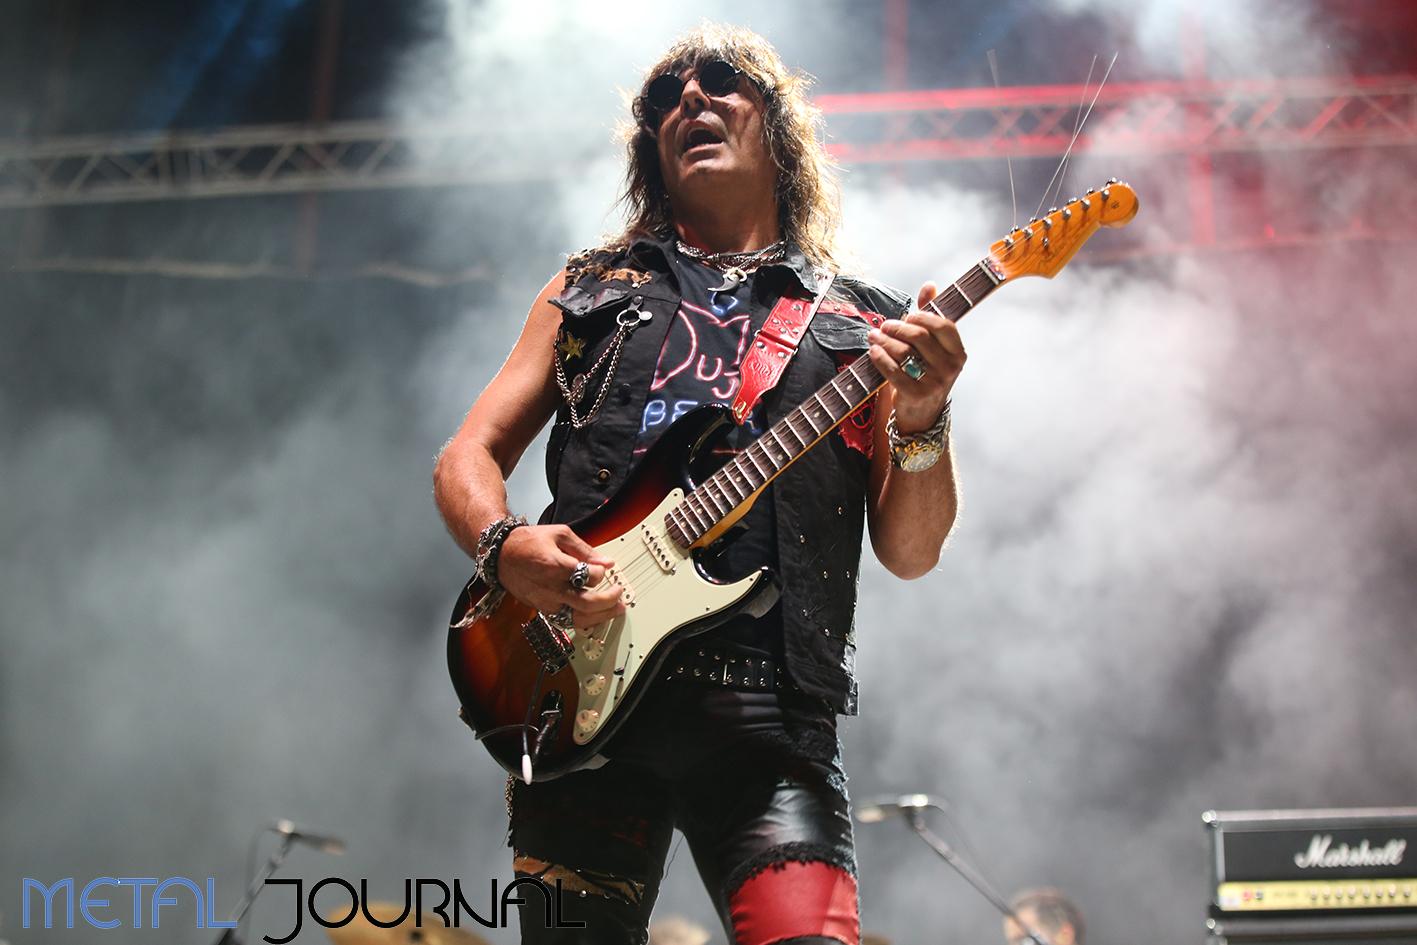 rata blanca - leyendas del rock 2019 metal journal pic 11